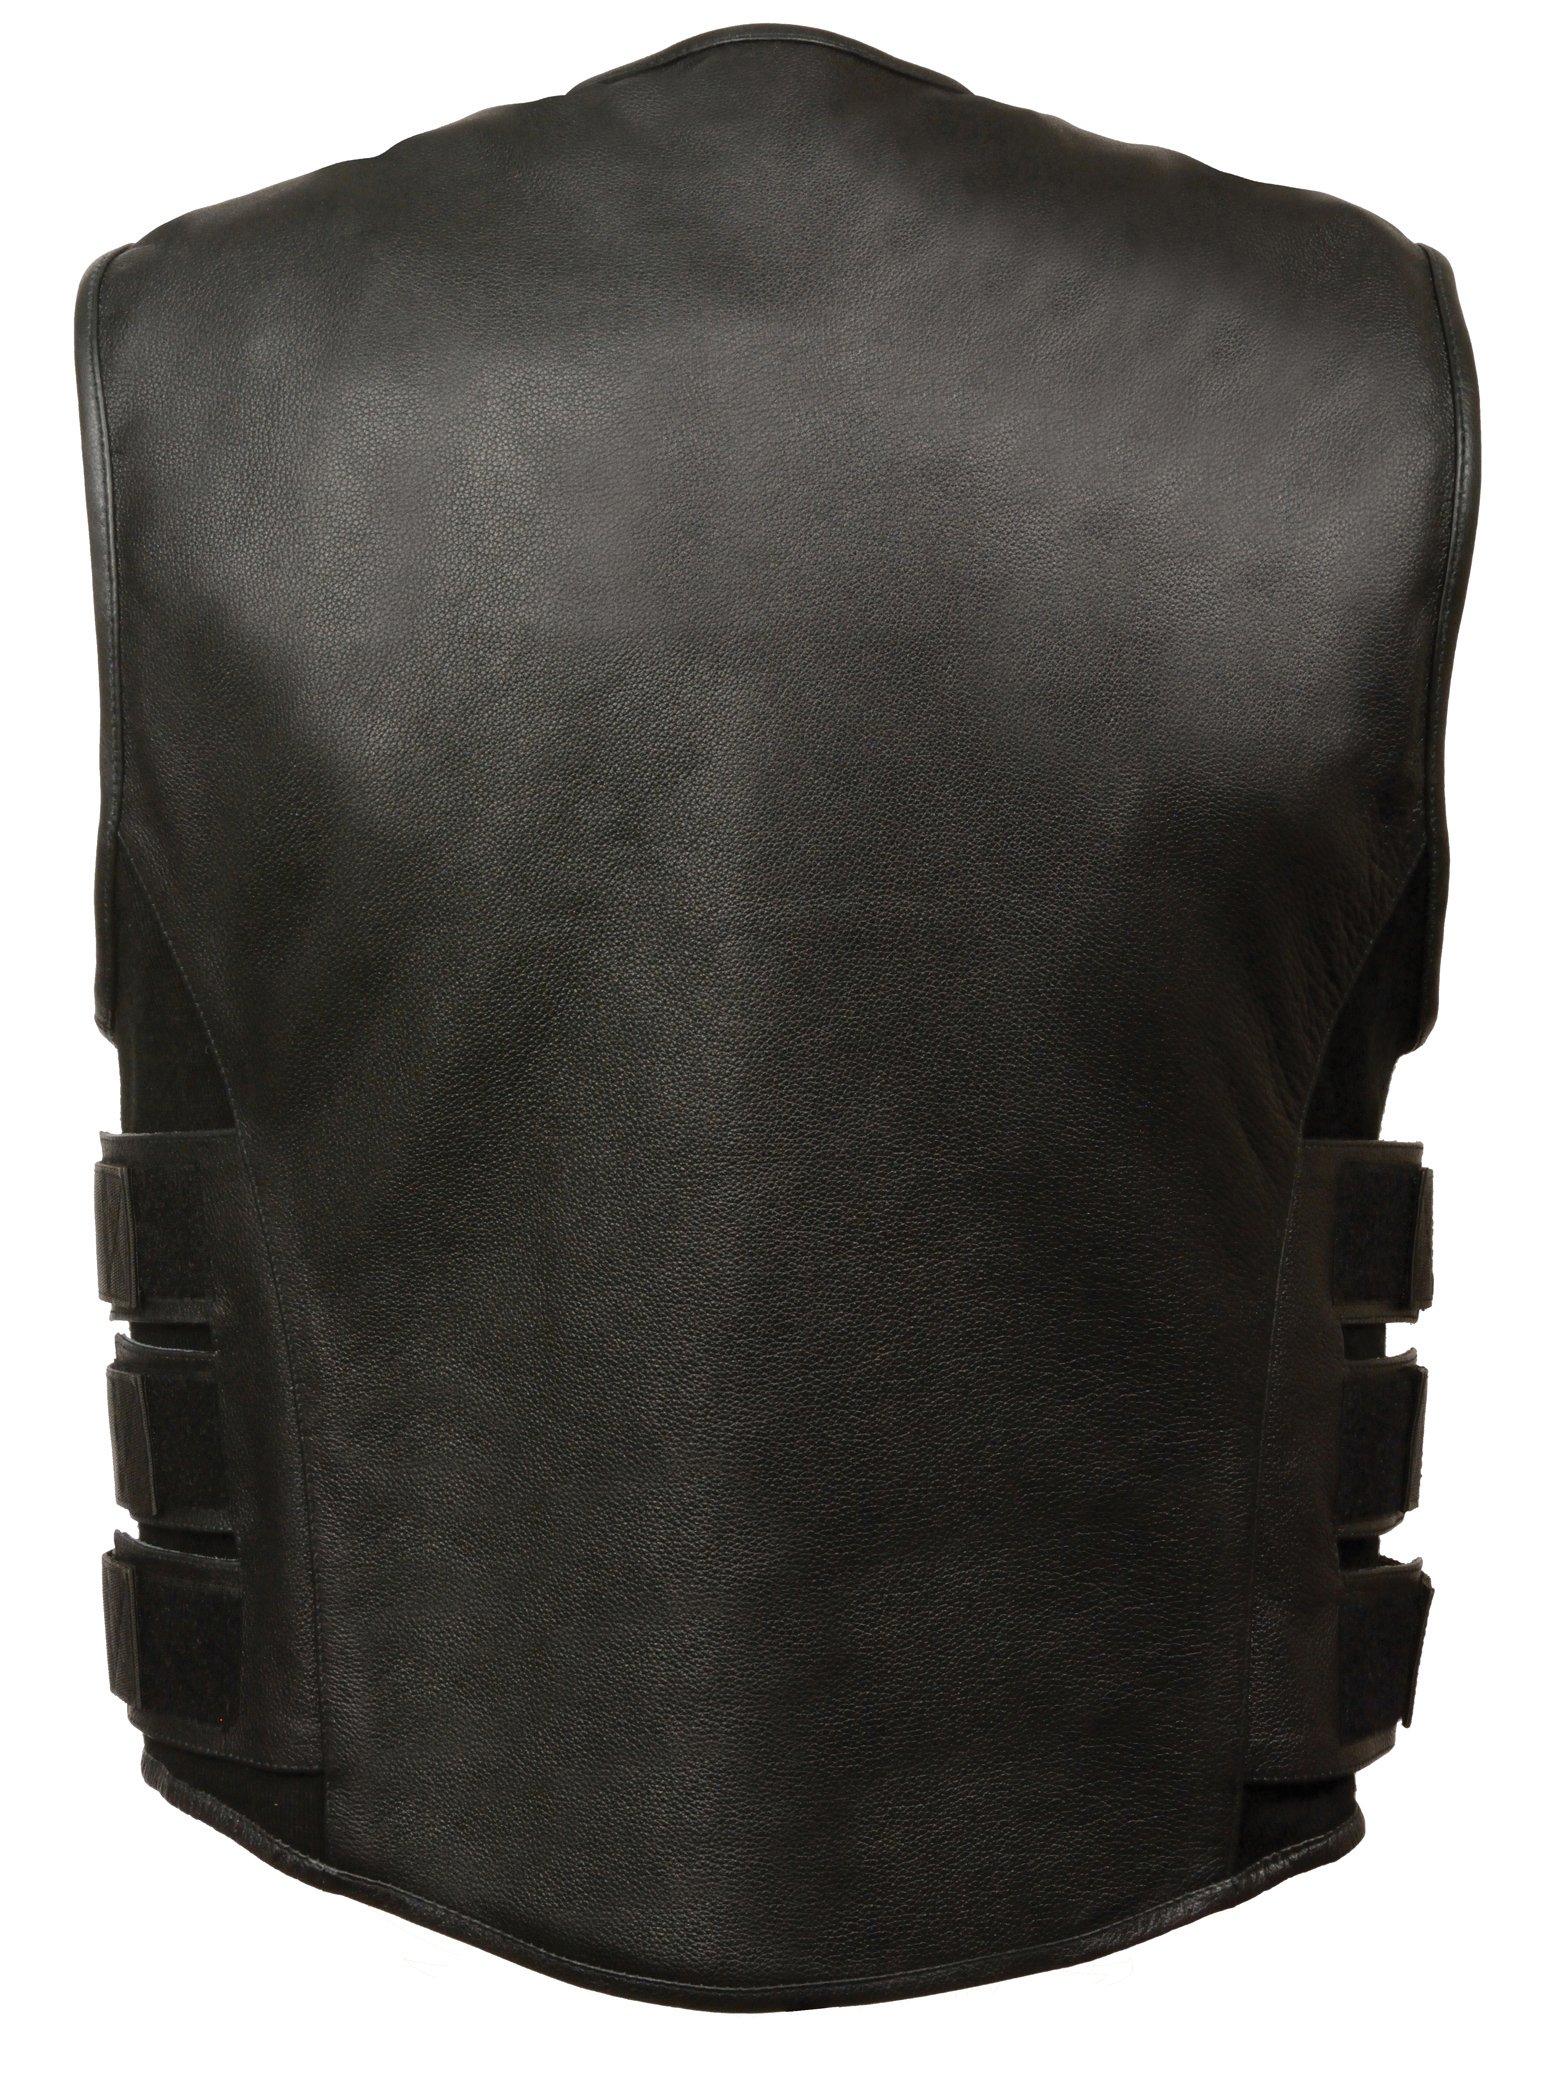 Men's Leather SWAT Style Vest | Premium Natural Buffalo Leather | Patch Access Lining, New Outseam Gun Pocket, Adjustable Side Straps, Zipper Front Closure | Black Biker Vest (Black, 3X-Large) by The Bikers Zone (Image #3)